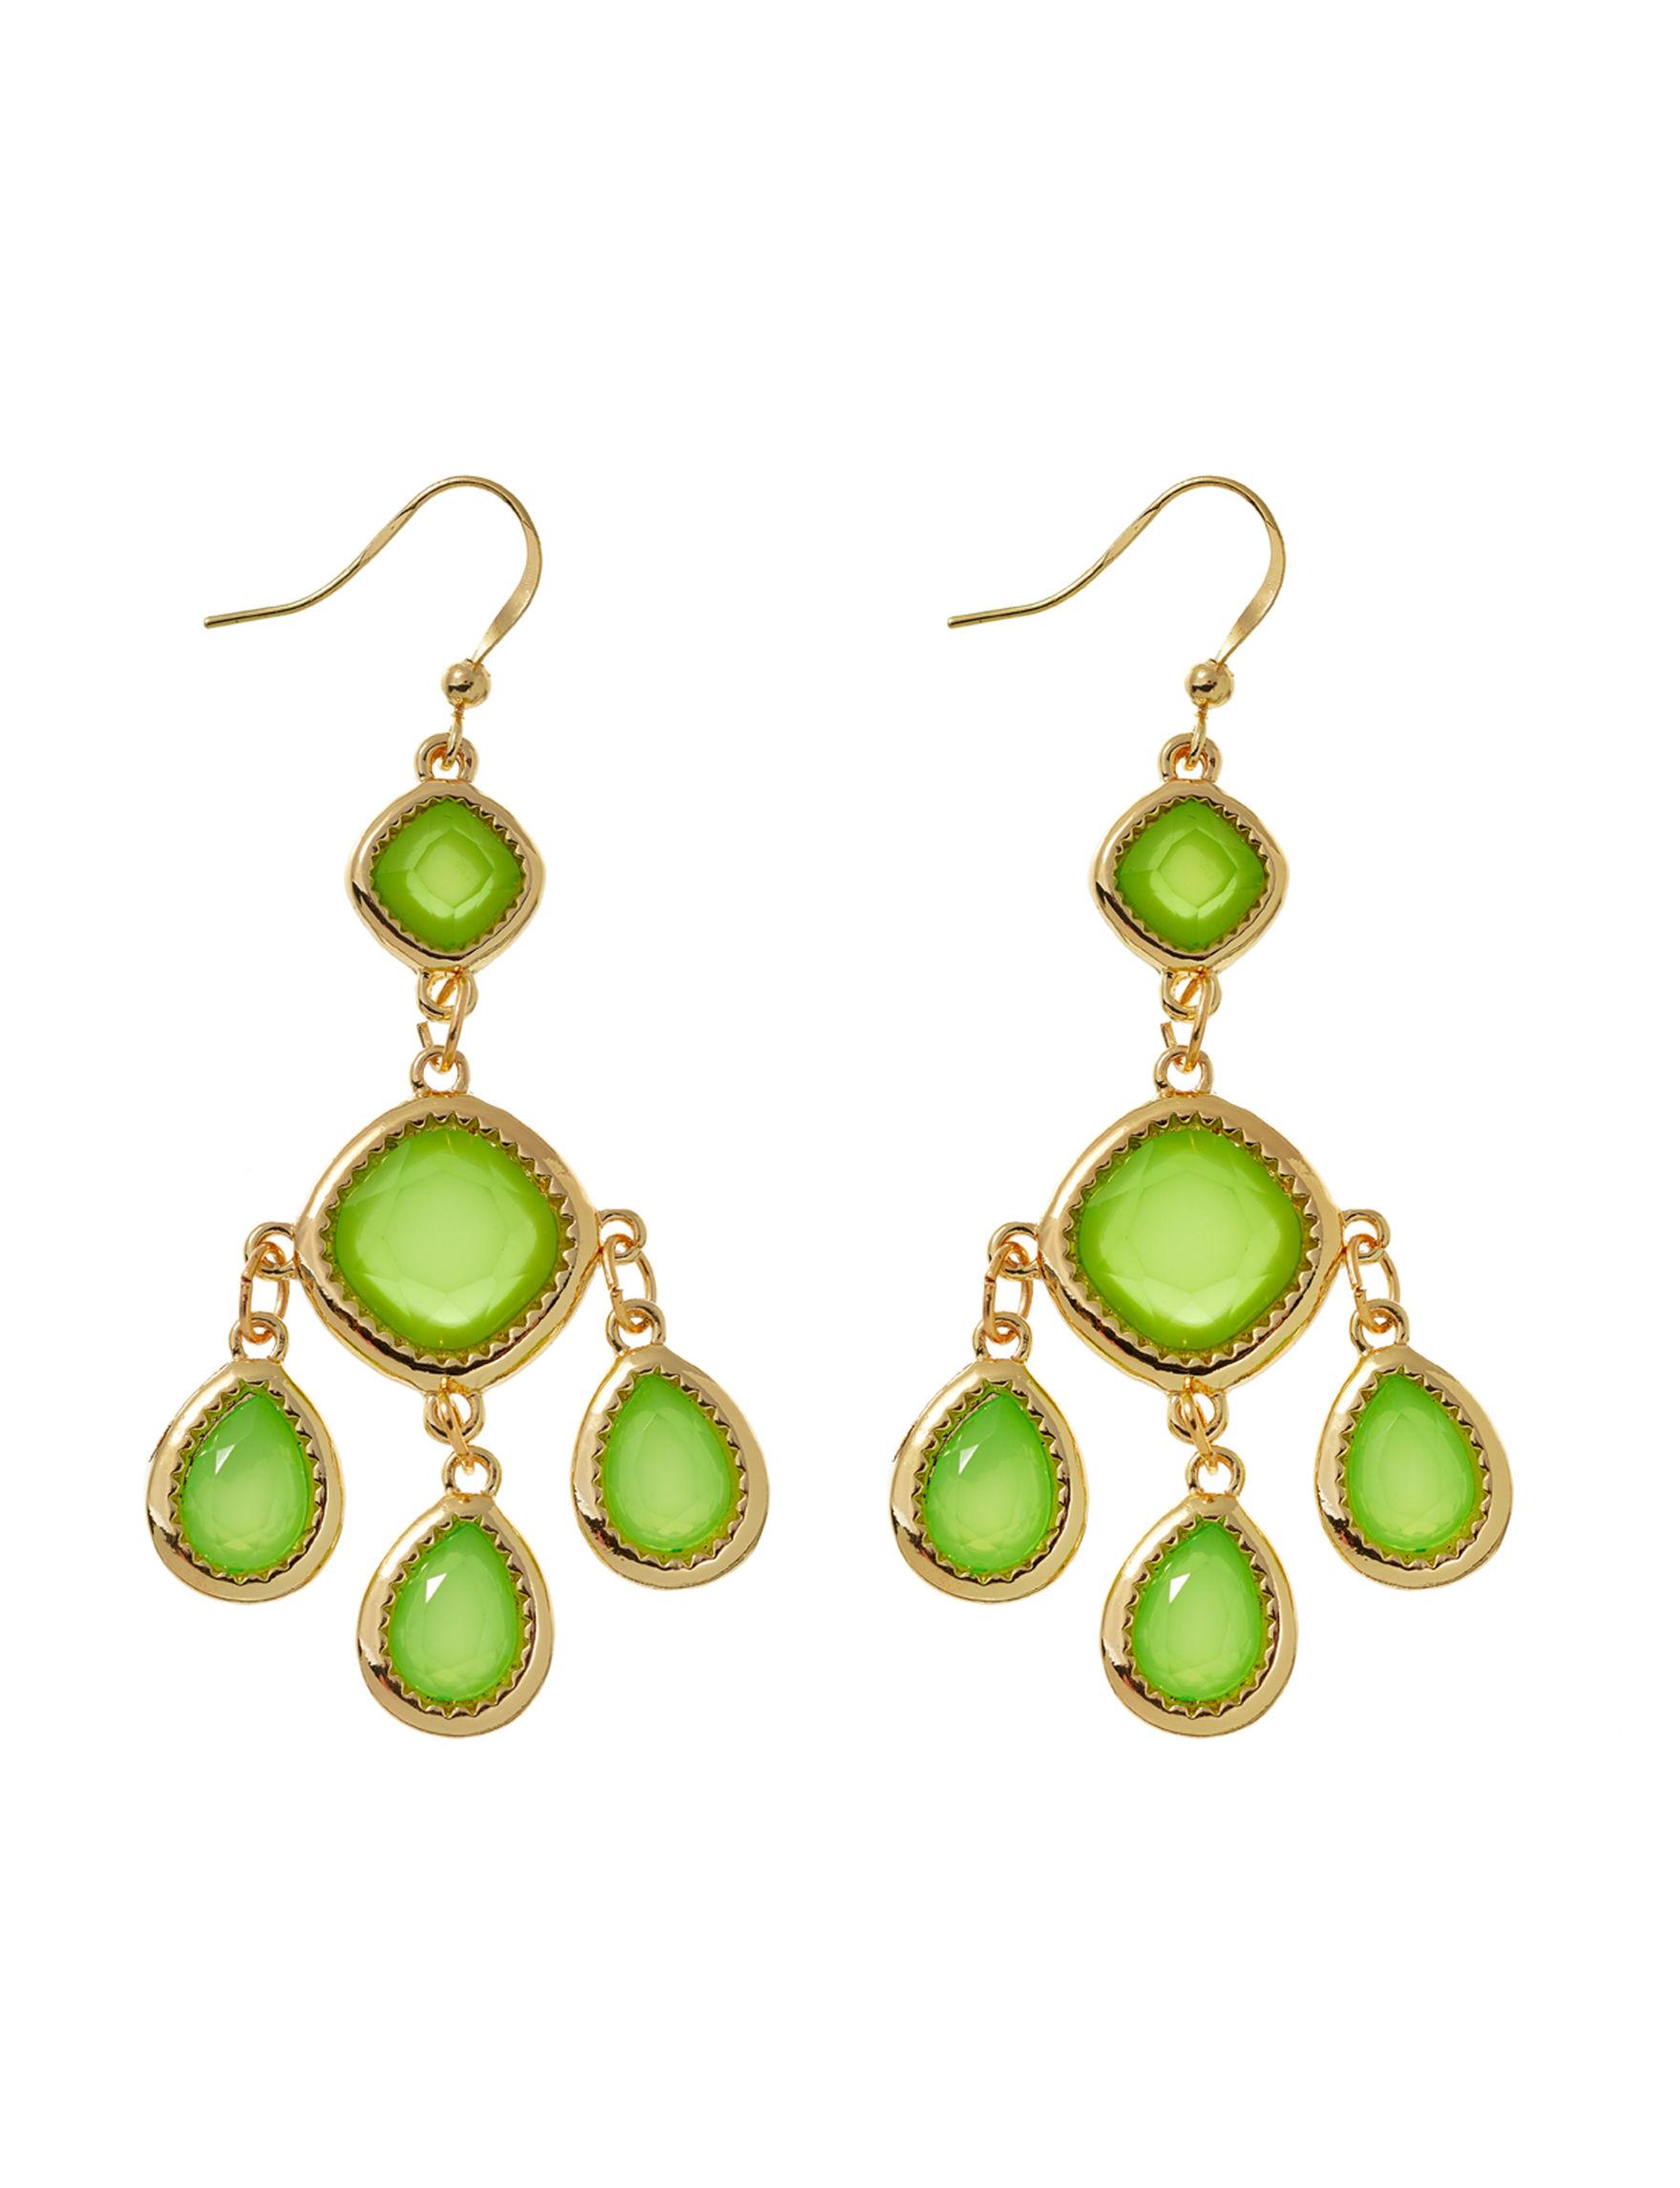 Hannah Lime Drops Earrings Fashion Jewelry